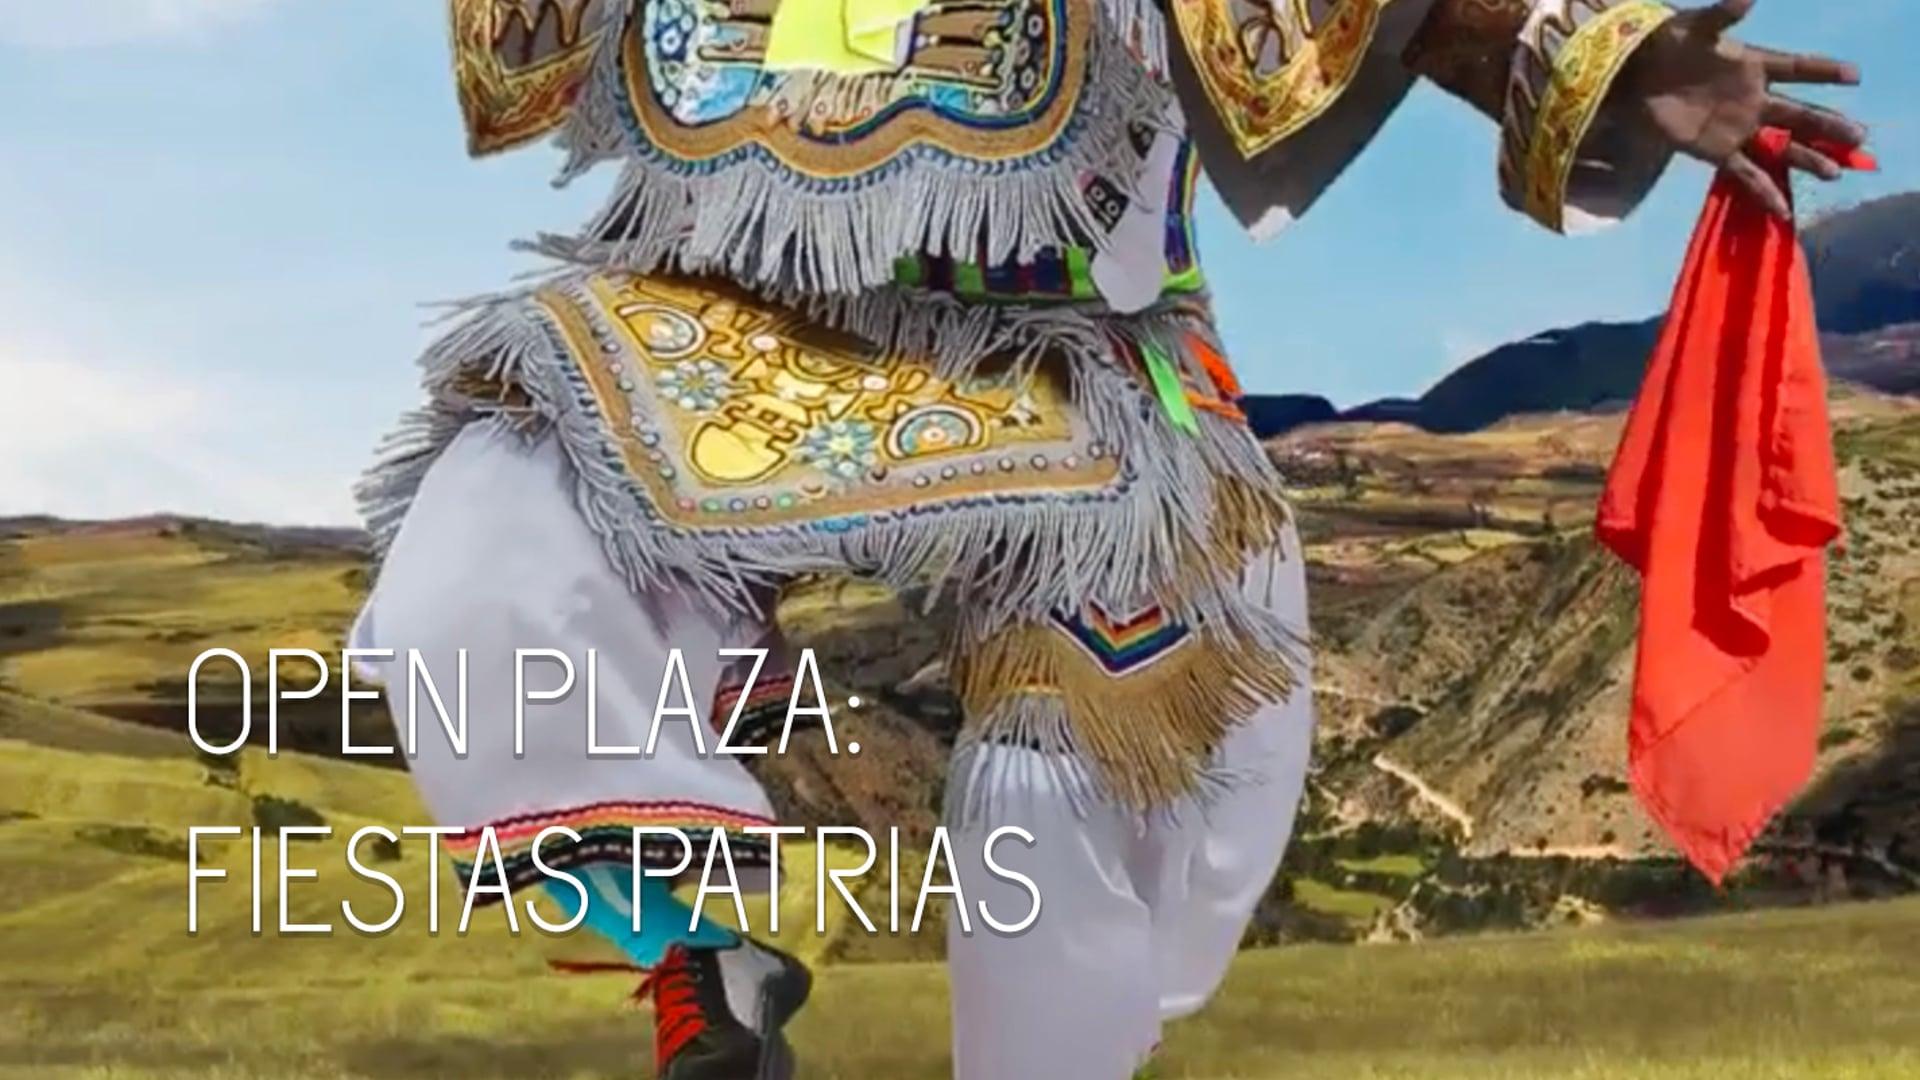 Open Plaza - Fiestas Patrias